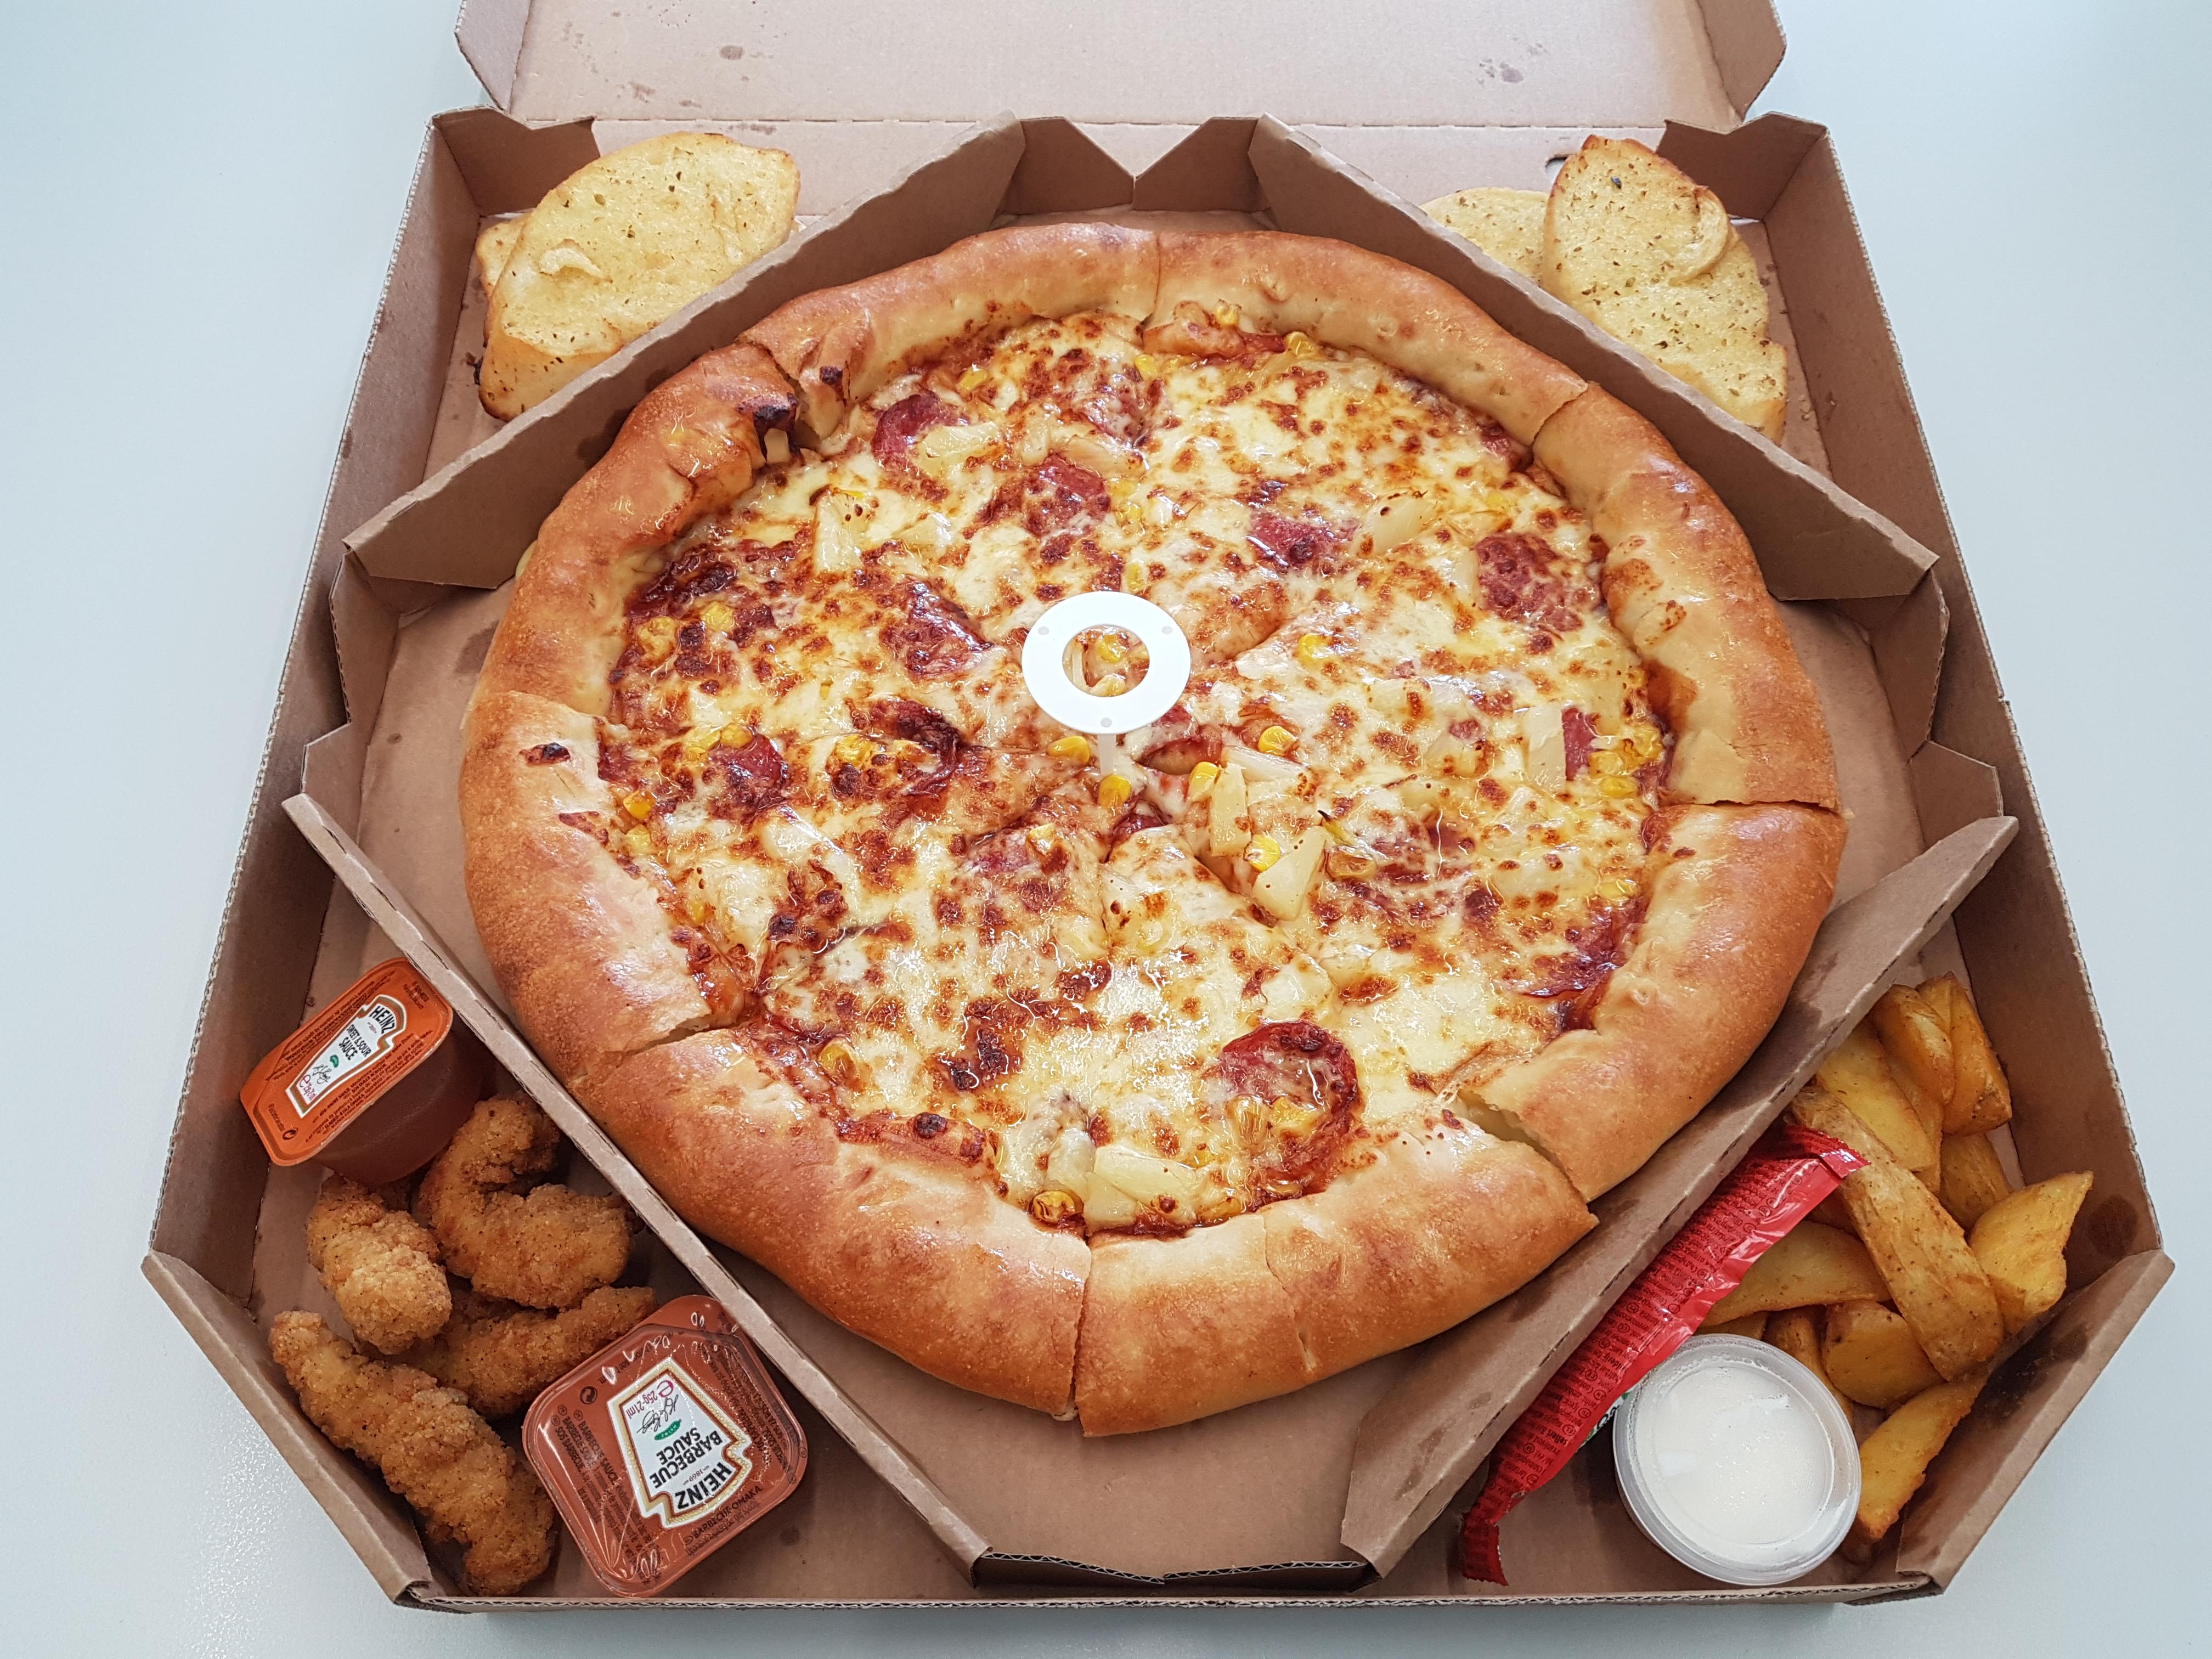 https://foodloader.net/Holz_2019-05-03_Pizza_Hut_The_Box.jpg